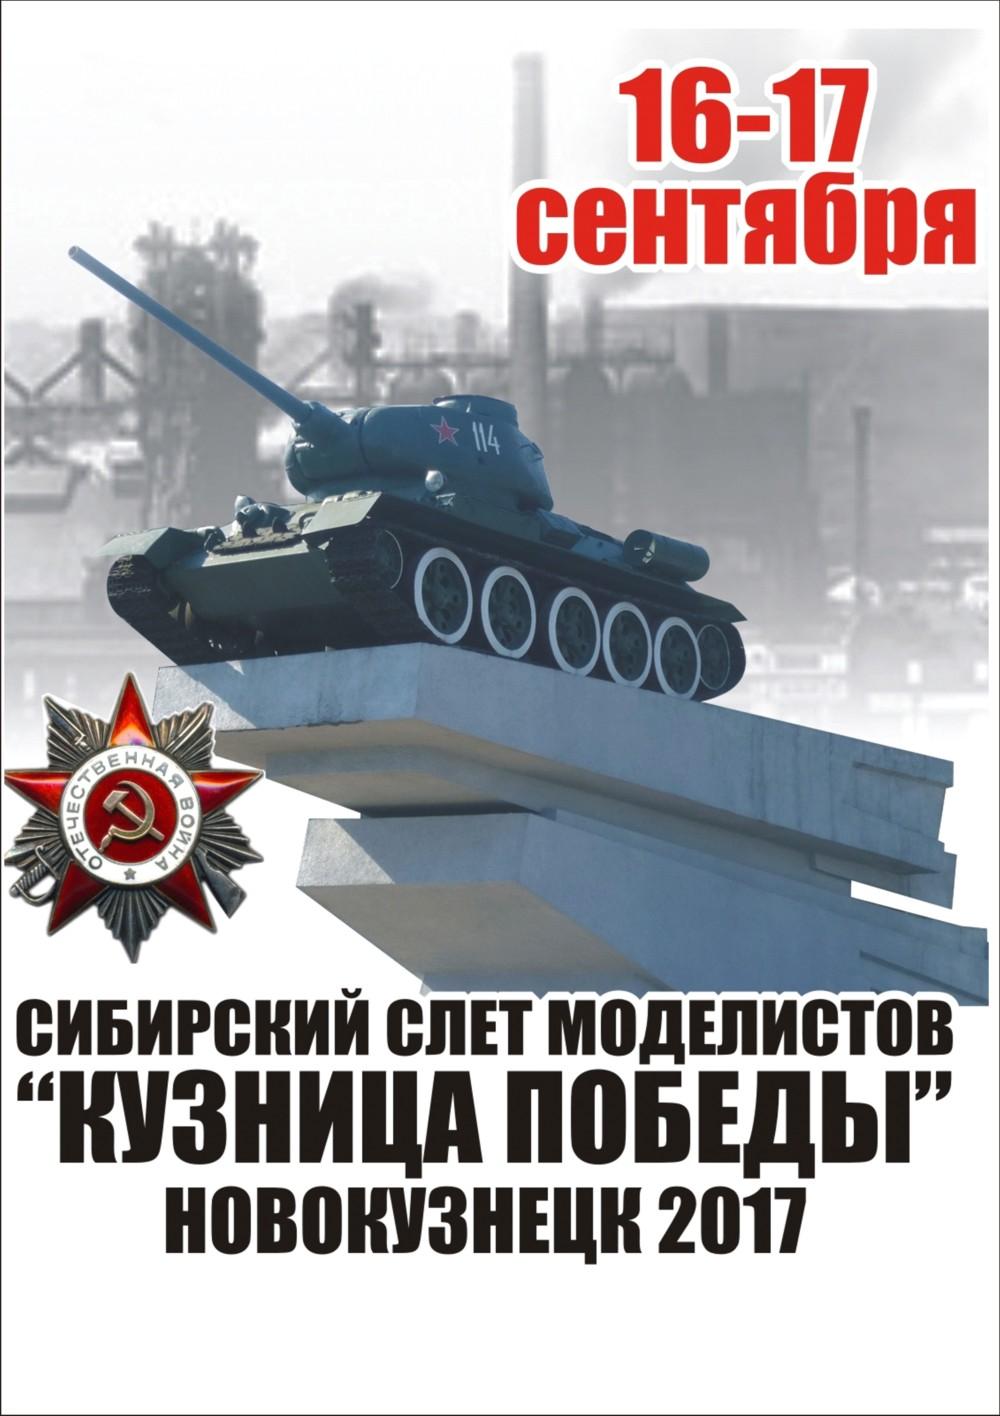 http://s3.uploads.ru/Qf5SN.jpg